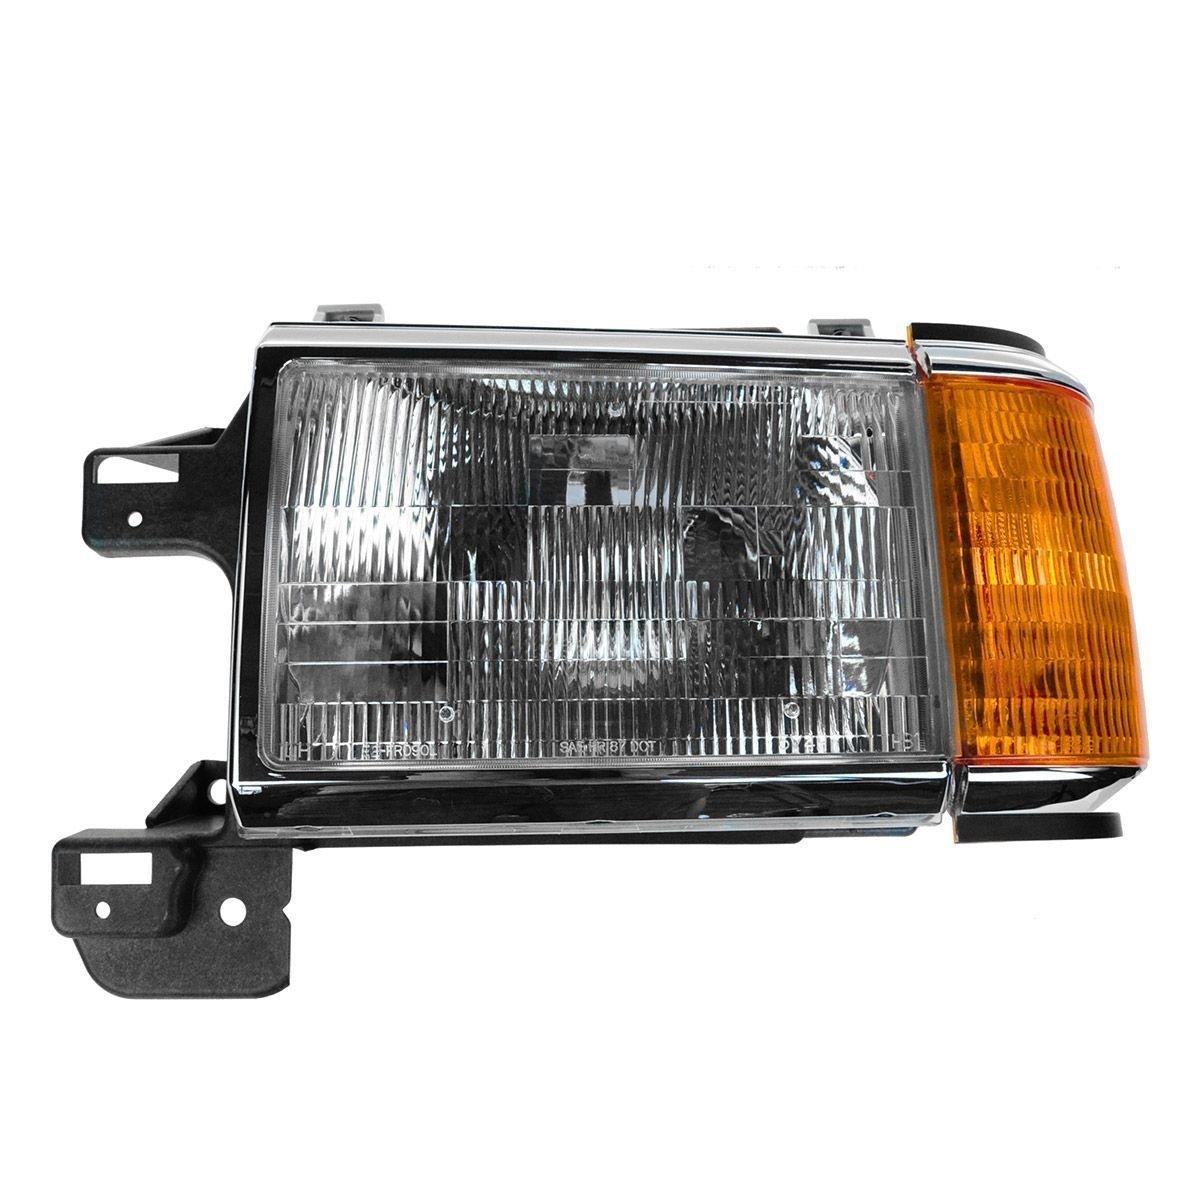 Coachmen Santara 1993-1995 RV Motorhome Left (Driver) Replacement Front Headlight & Signal Lights Lighting 4 U